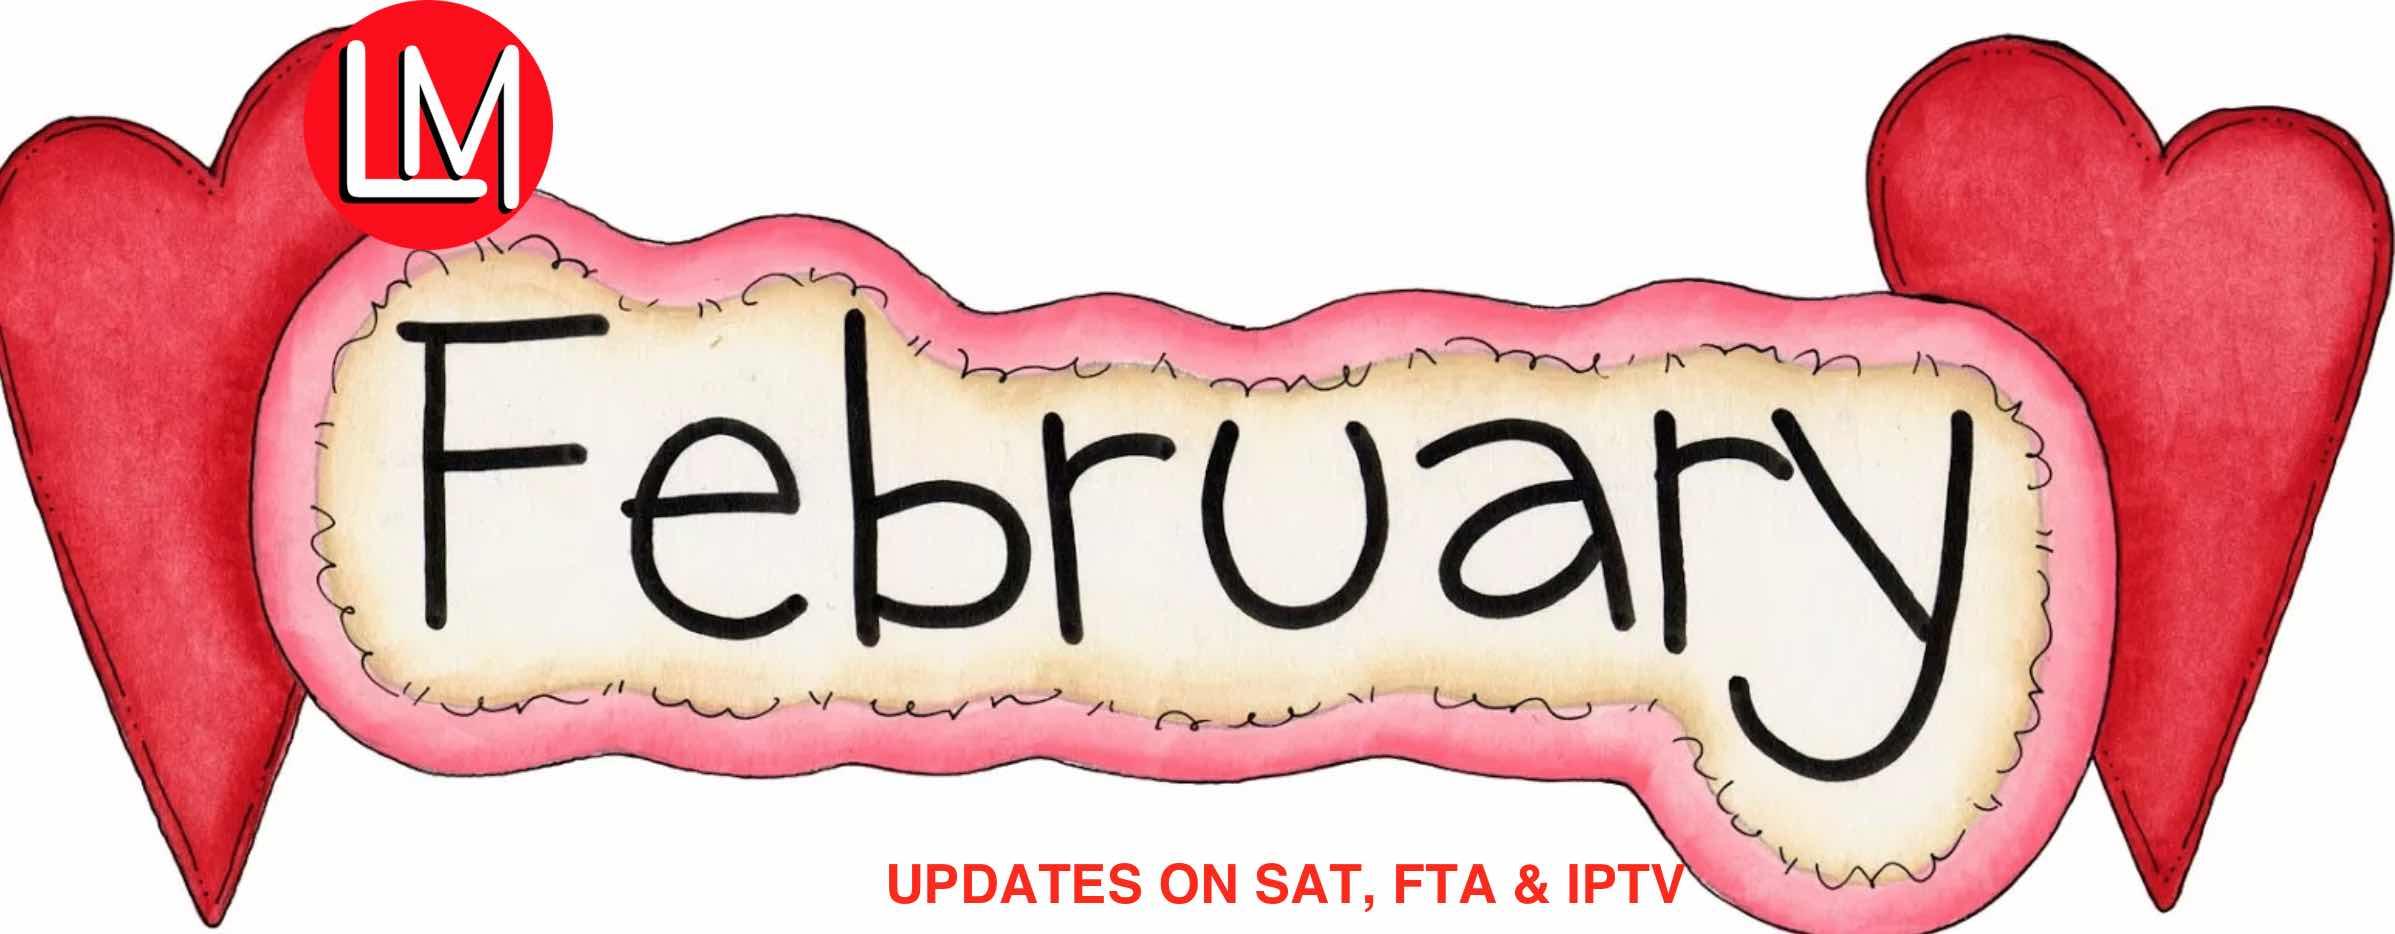 Lemmy Morgan February 2019 Update: IPTV, Sks, Iks, FTA and Data